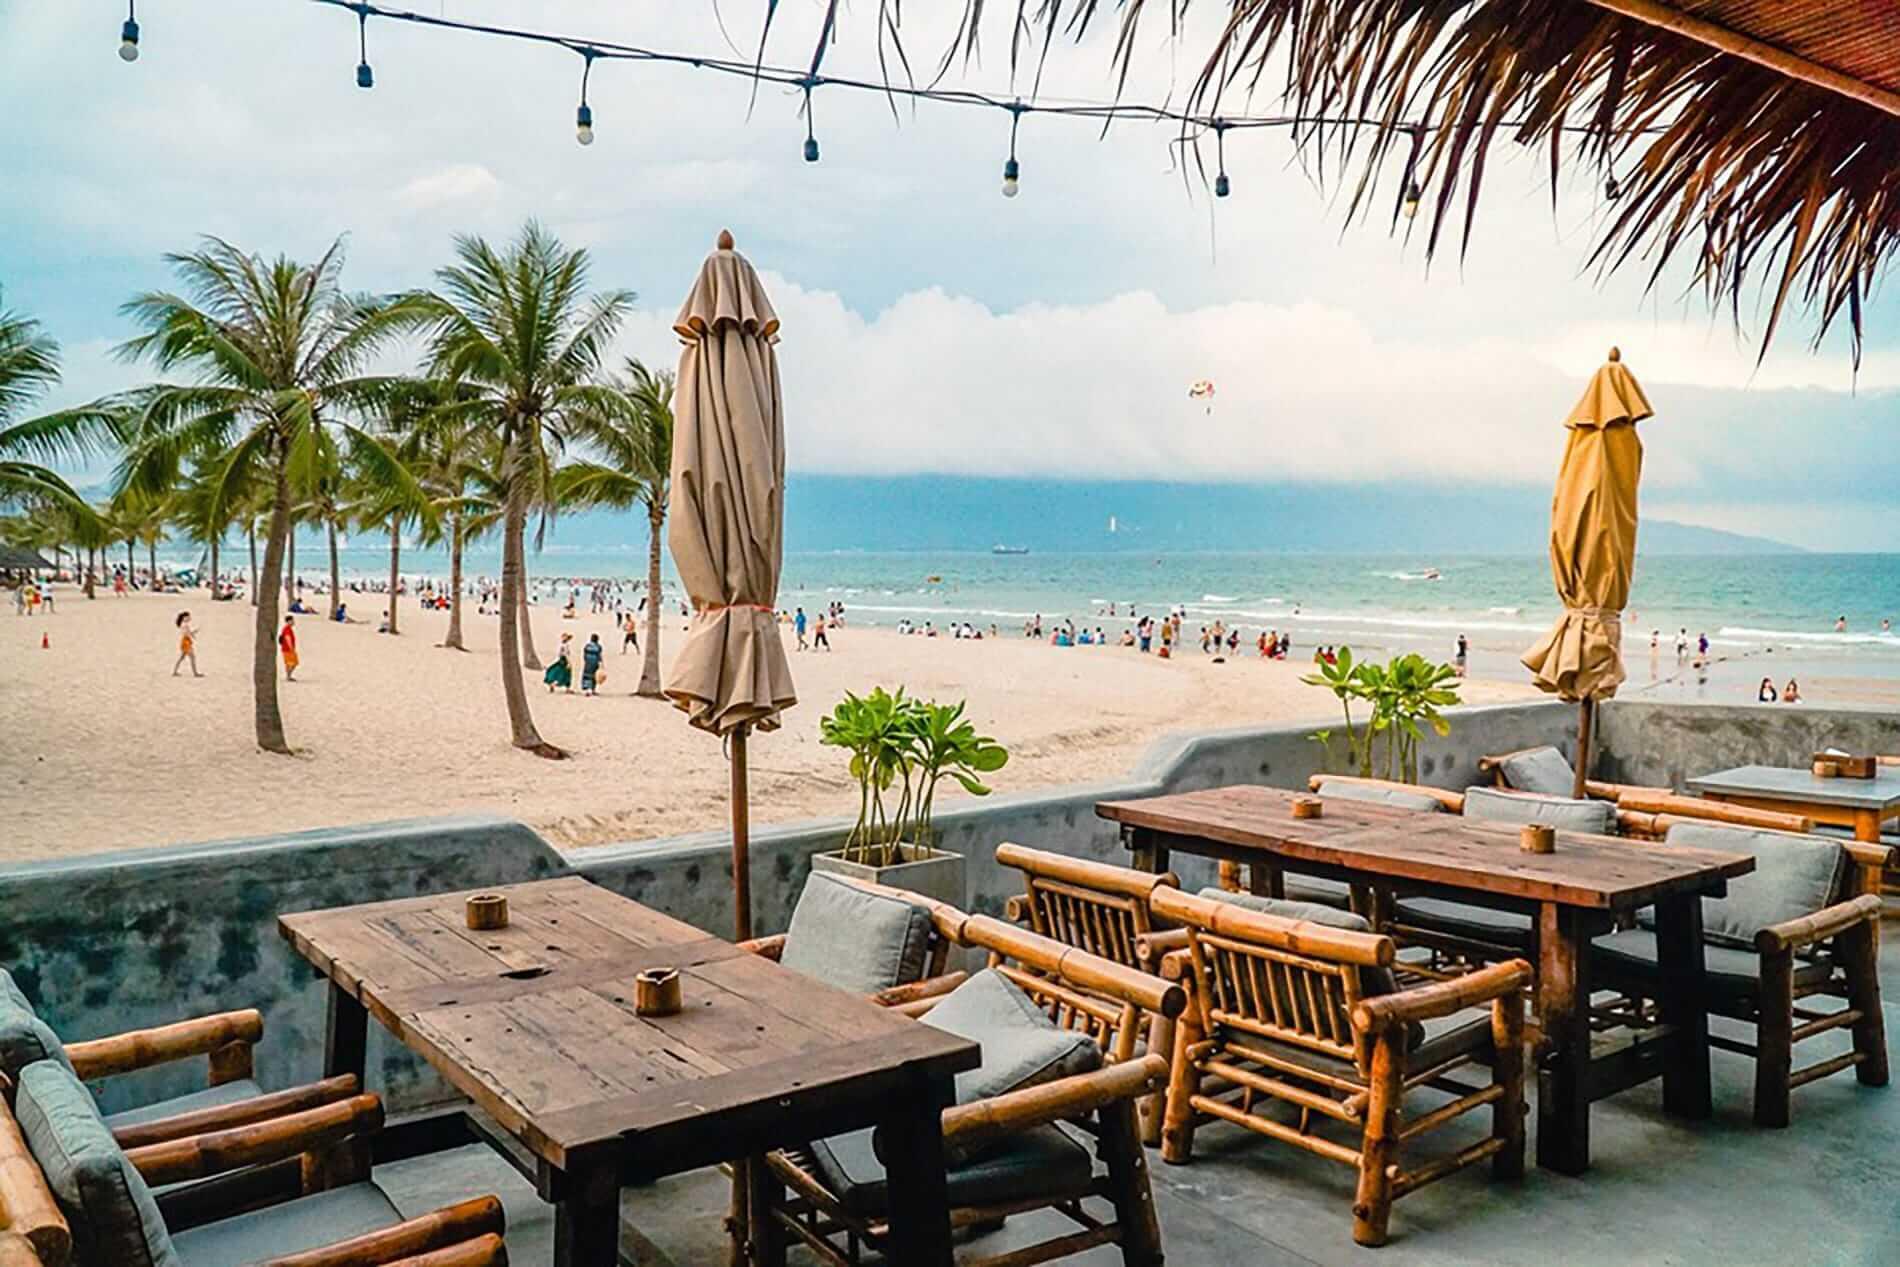 beachside decking overlooking the beach at Apocalypse Beach Club